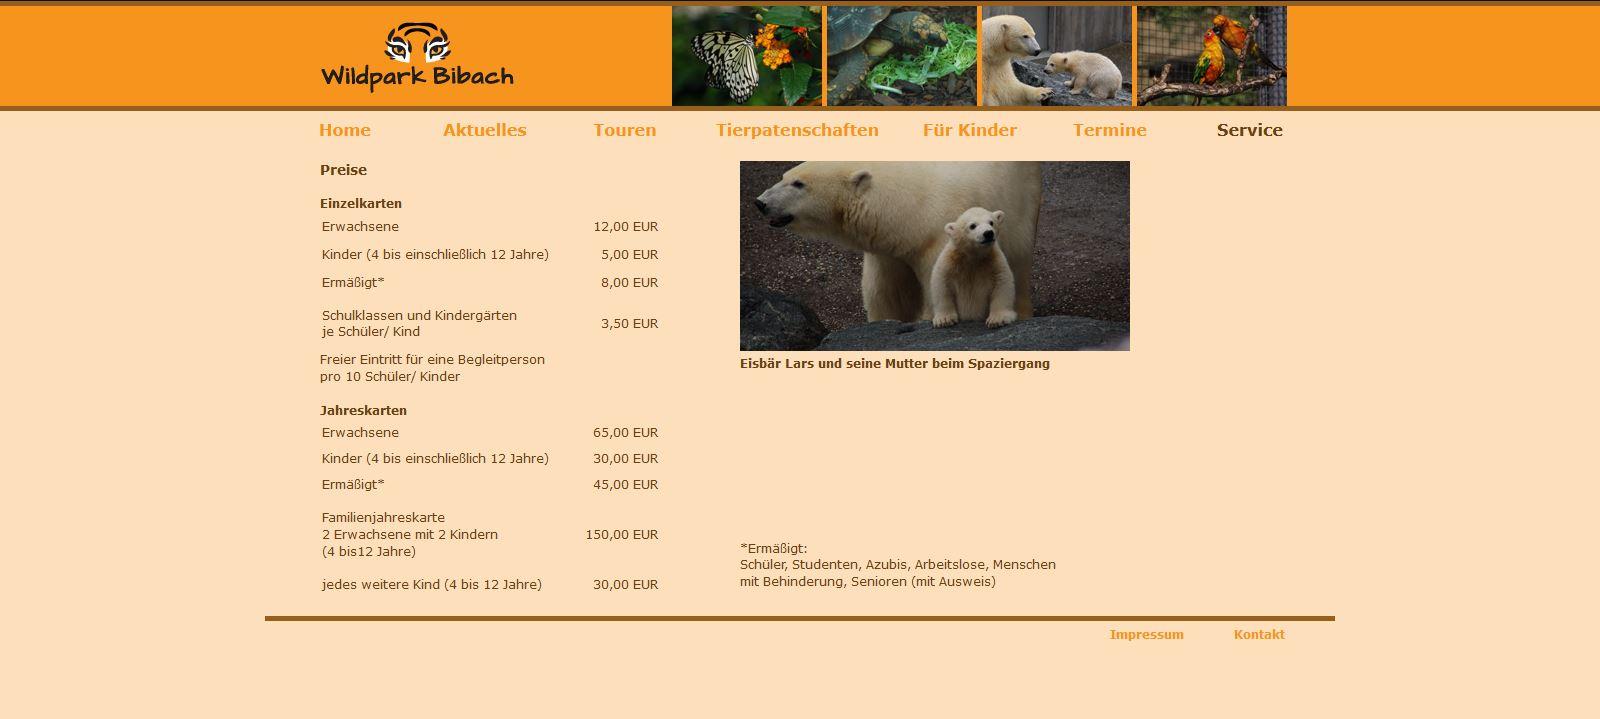 Wildpark Bibach - Service - Preise